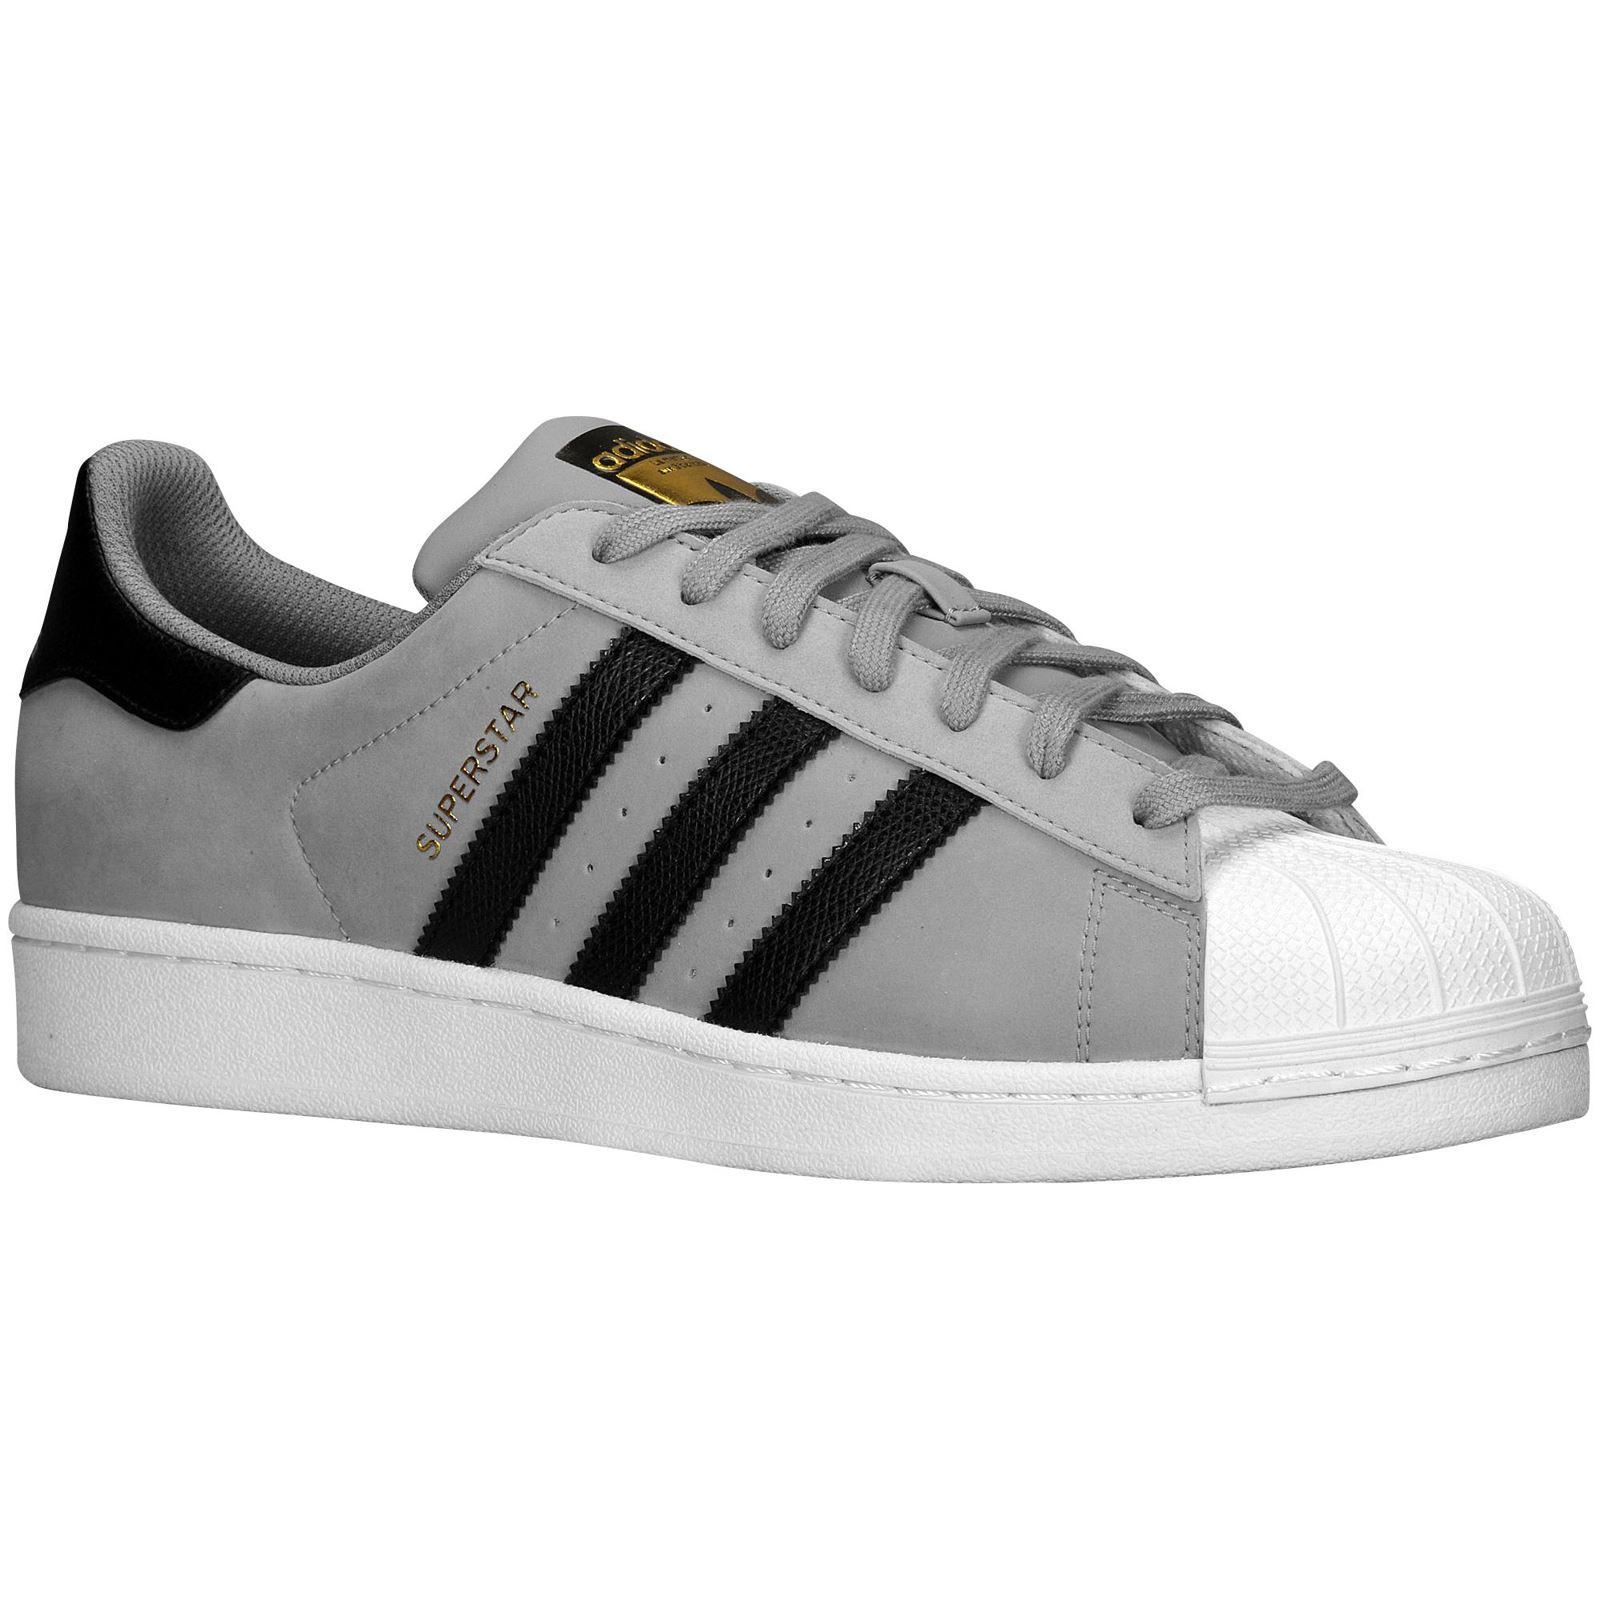 Adidas Superstar Black Grey